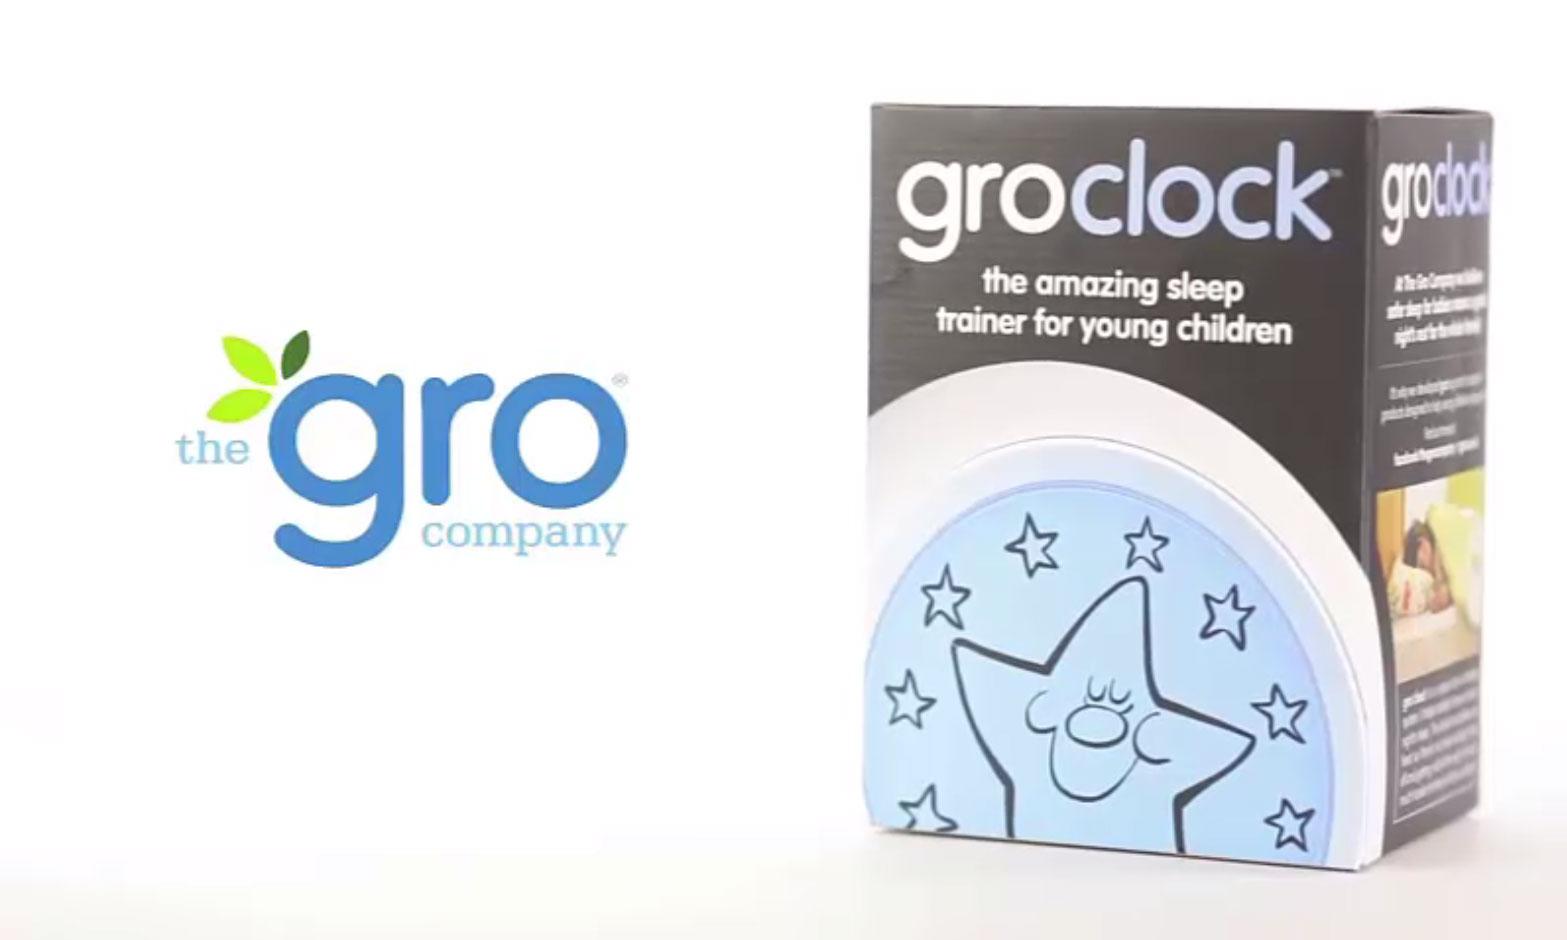 gro clock sleep trainer instructions